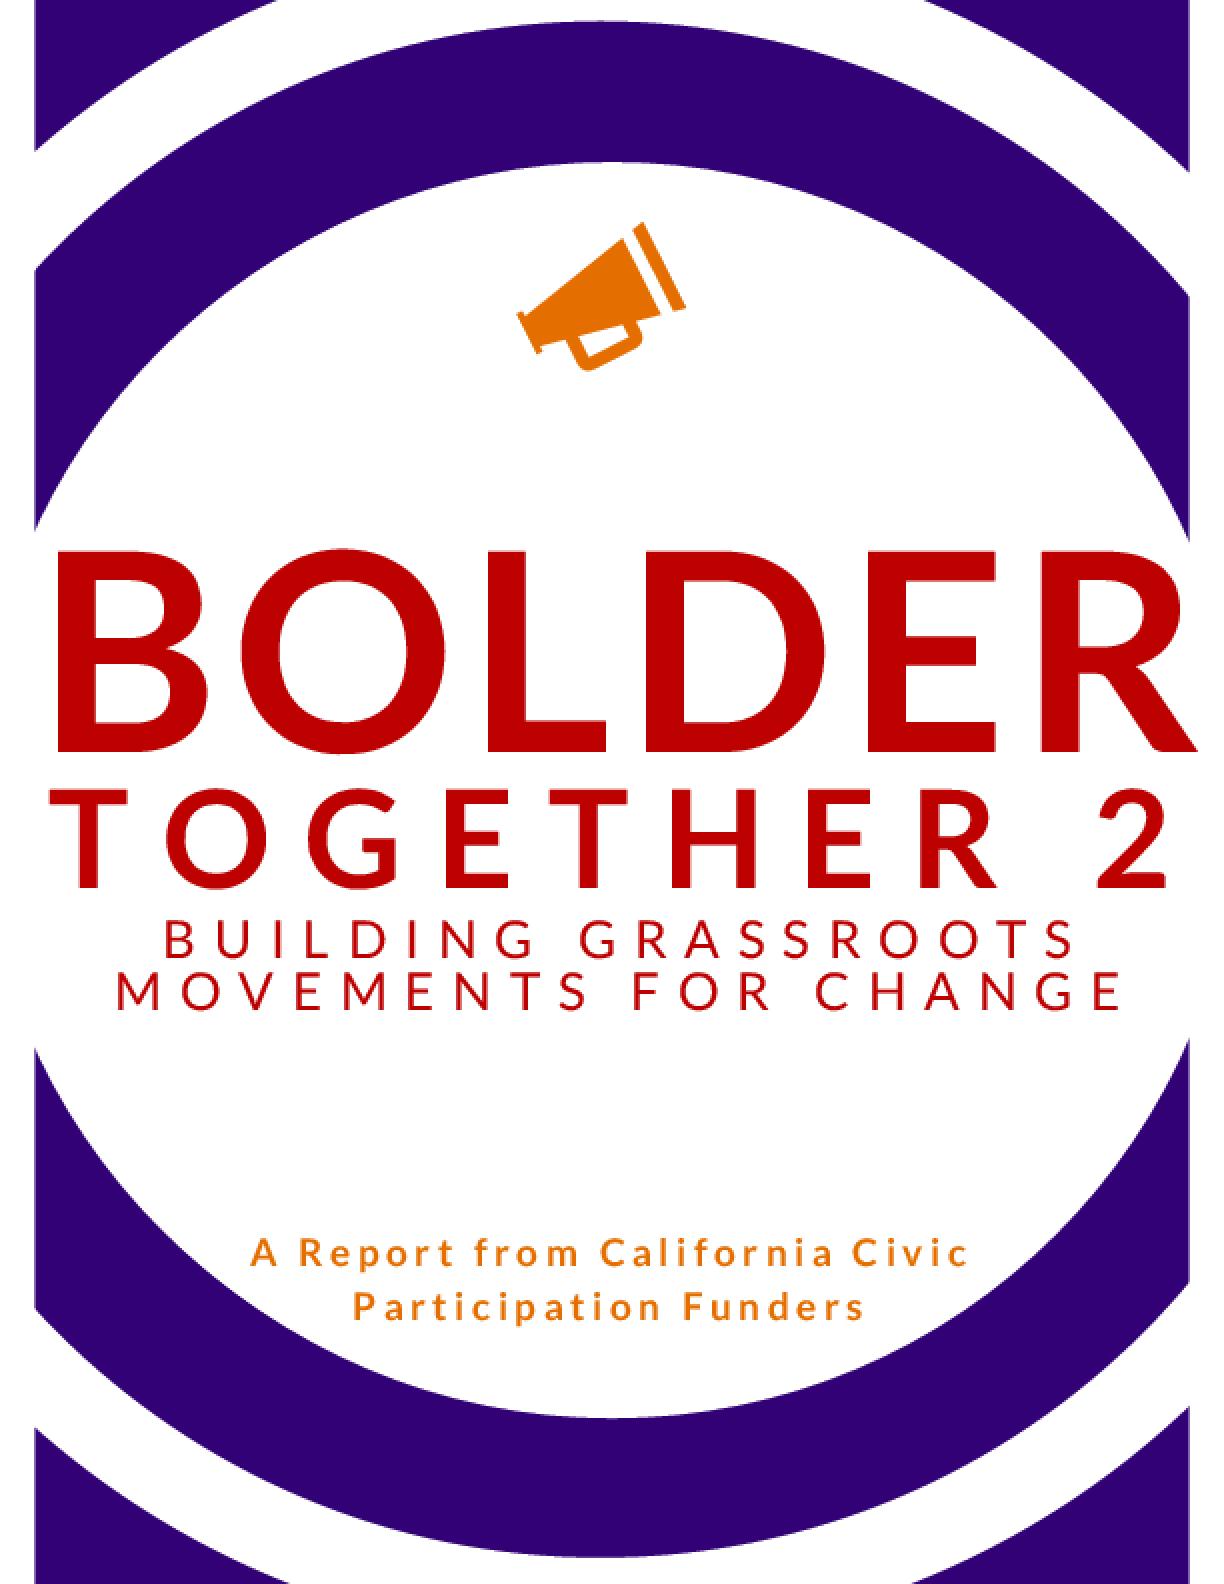 Bolder Together 2: Building Grassroots Movements for Change